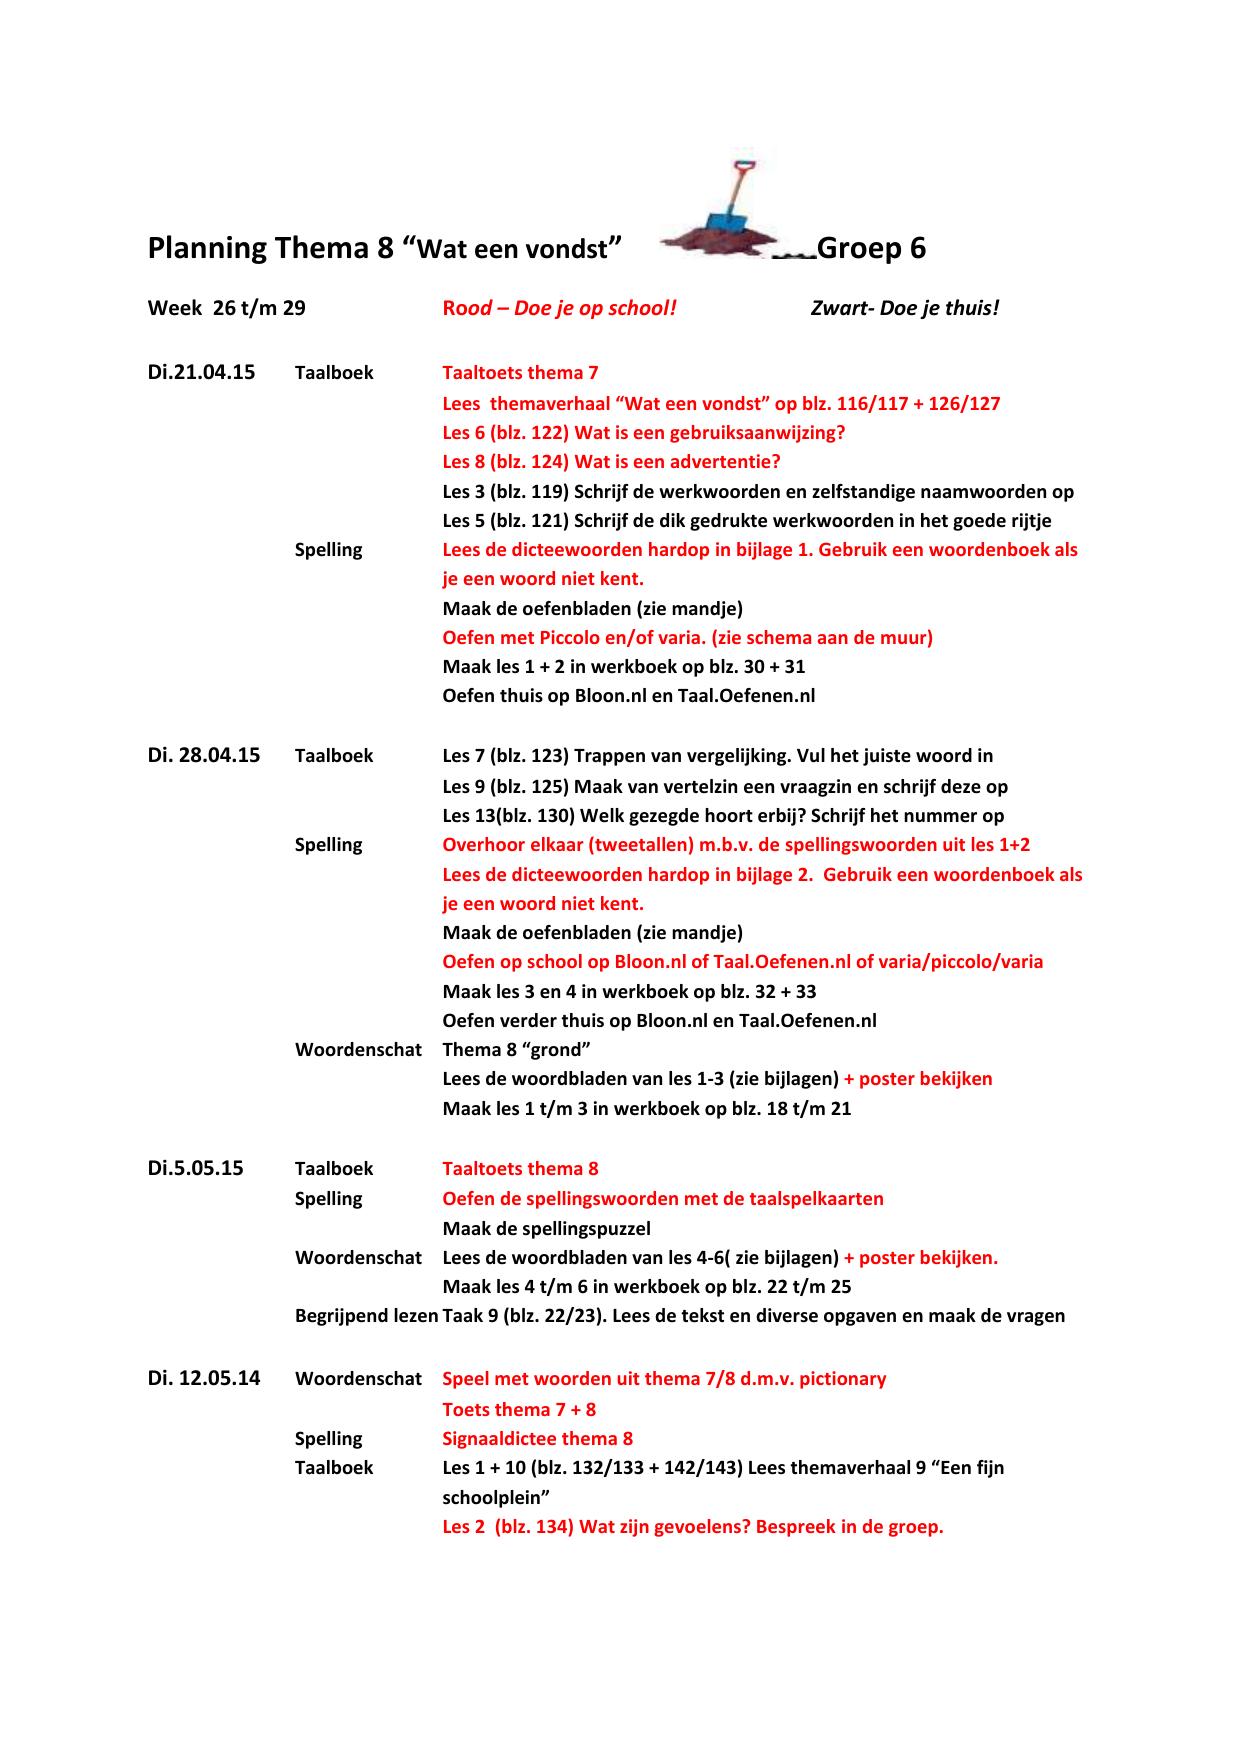 "Bekend Planning Thema 8 ""Wat een vondst"" Groep 6 Week 26 t/m 29 Rood #TD07"